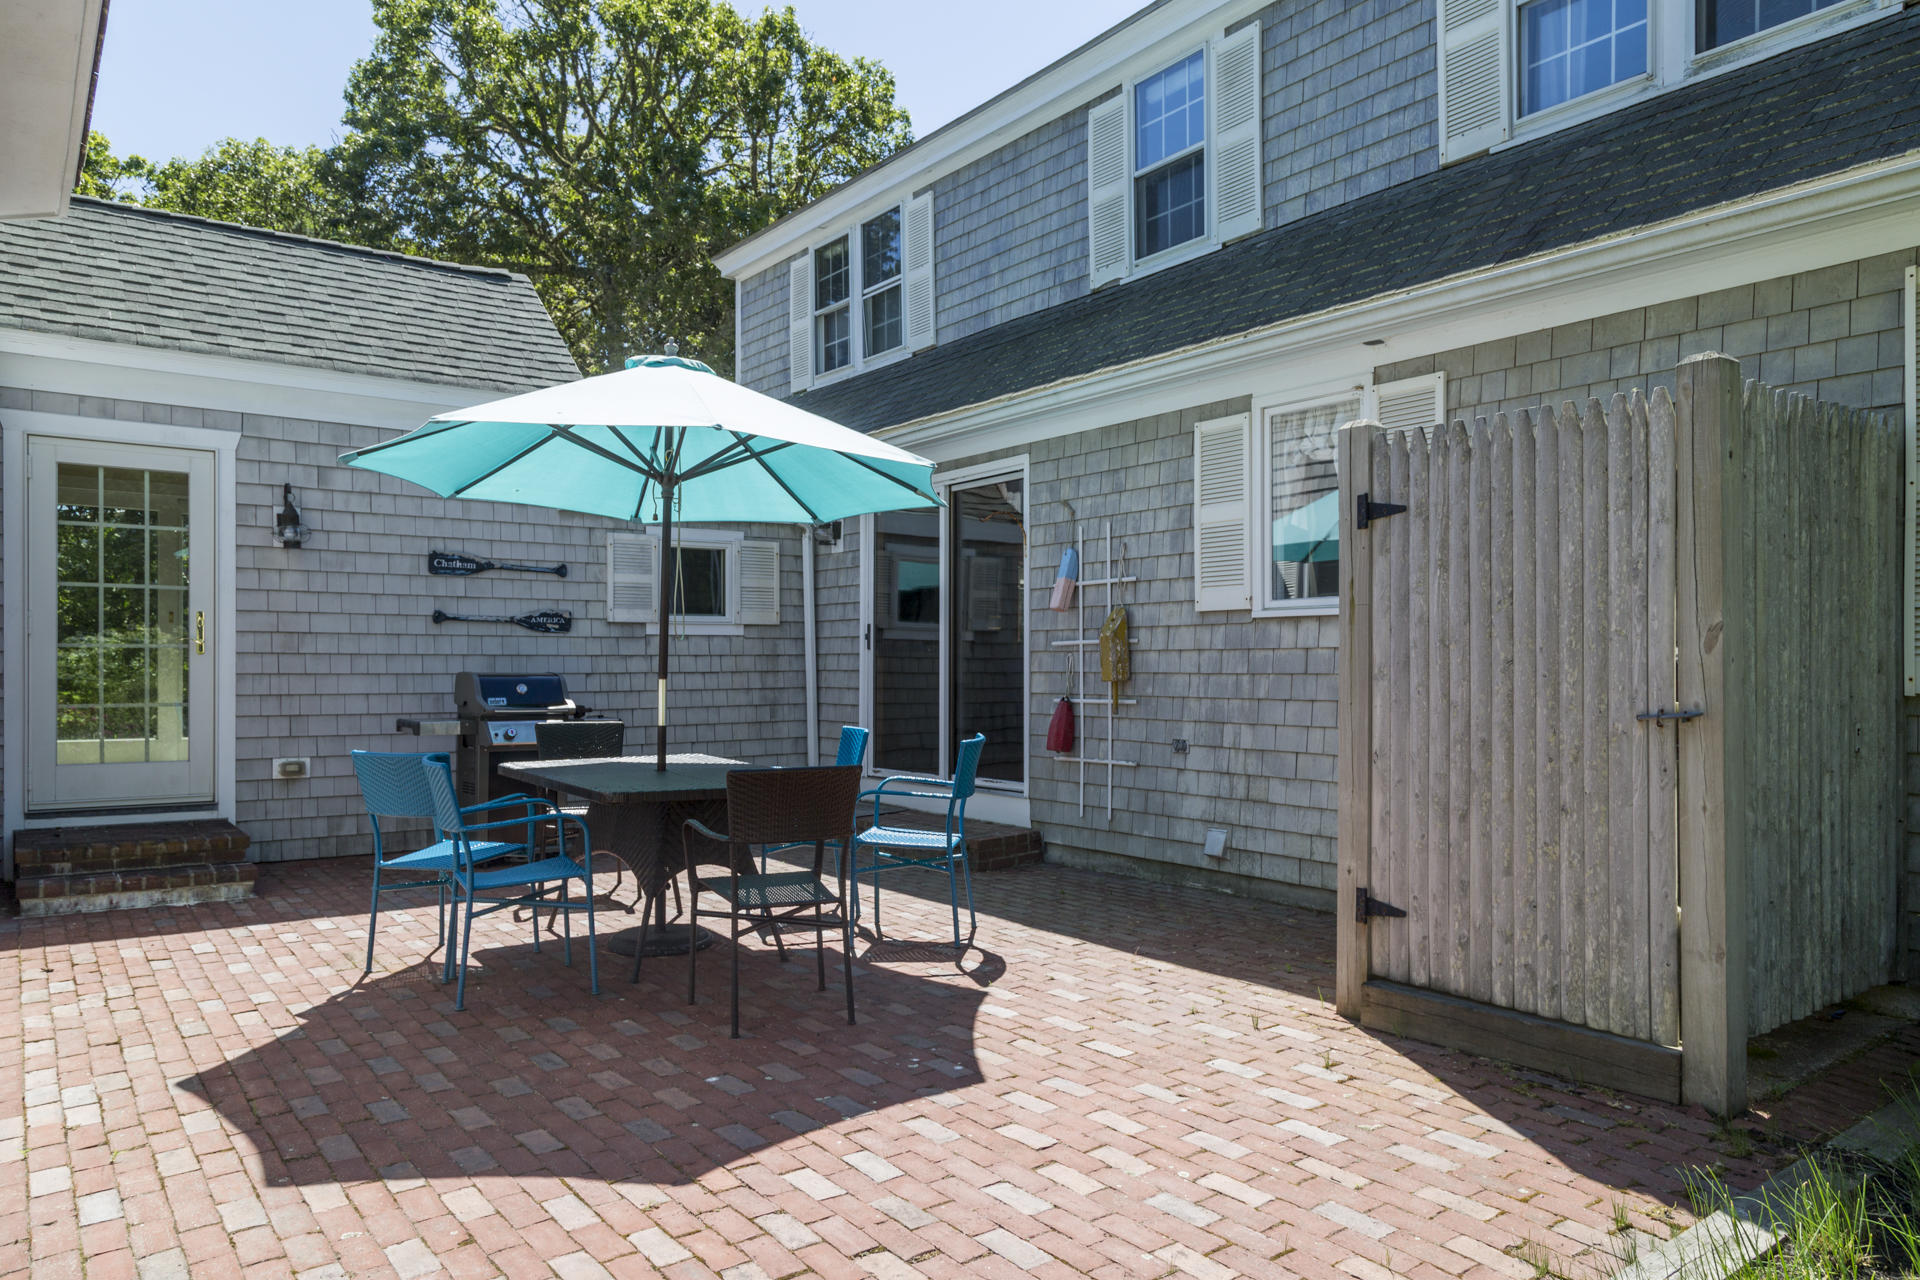 68 Summerhill Lane, Chatham MA, 02633 - slide 30